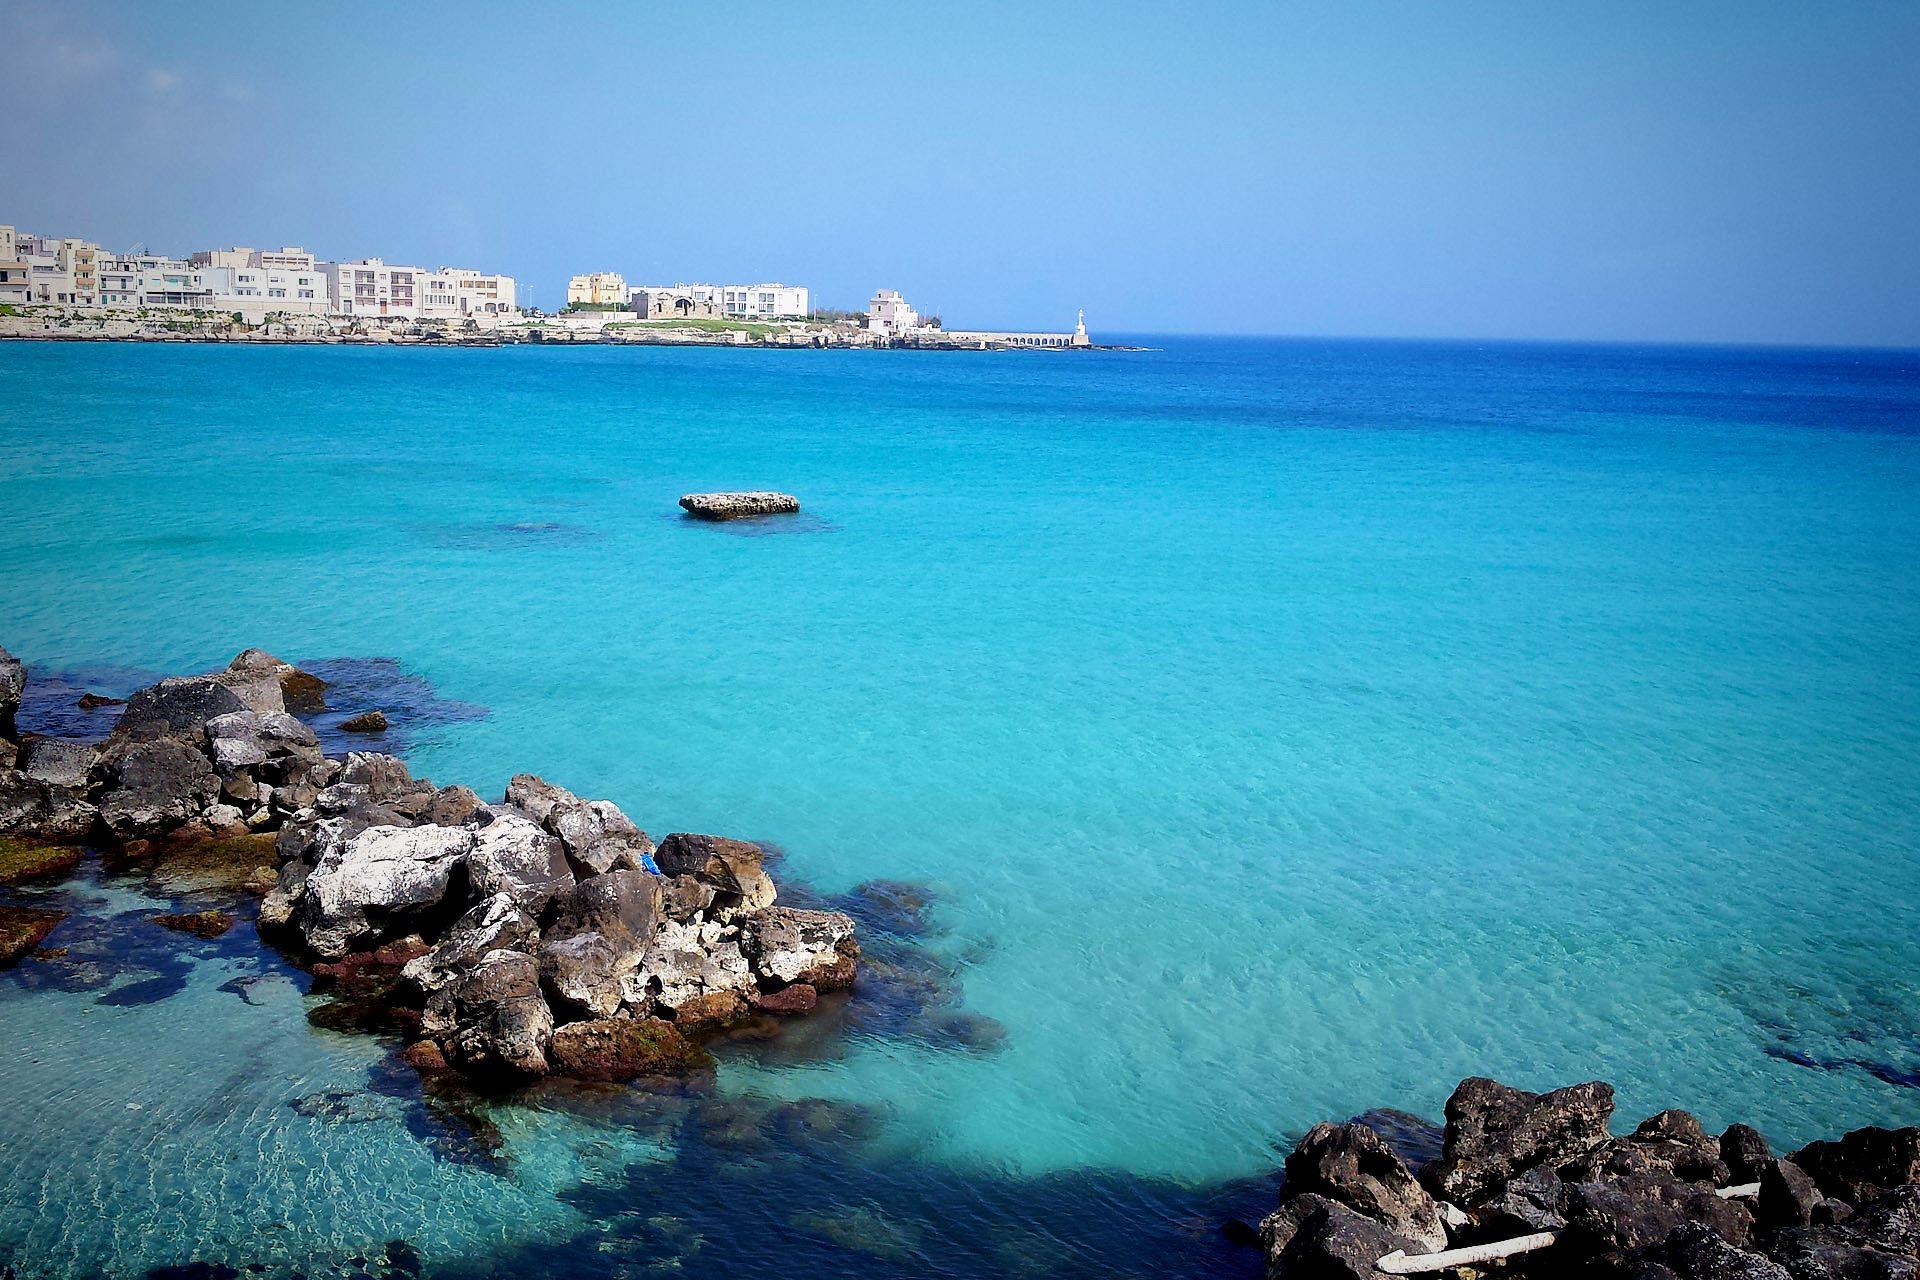 apulia slow travel Otranto salento puglia apulien adriatic adria beautiful